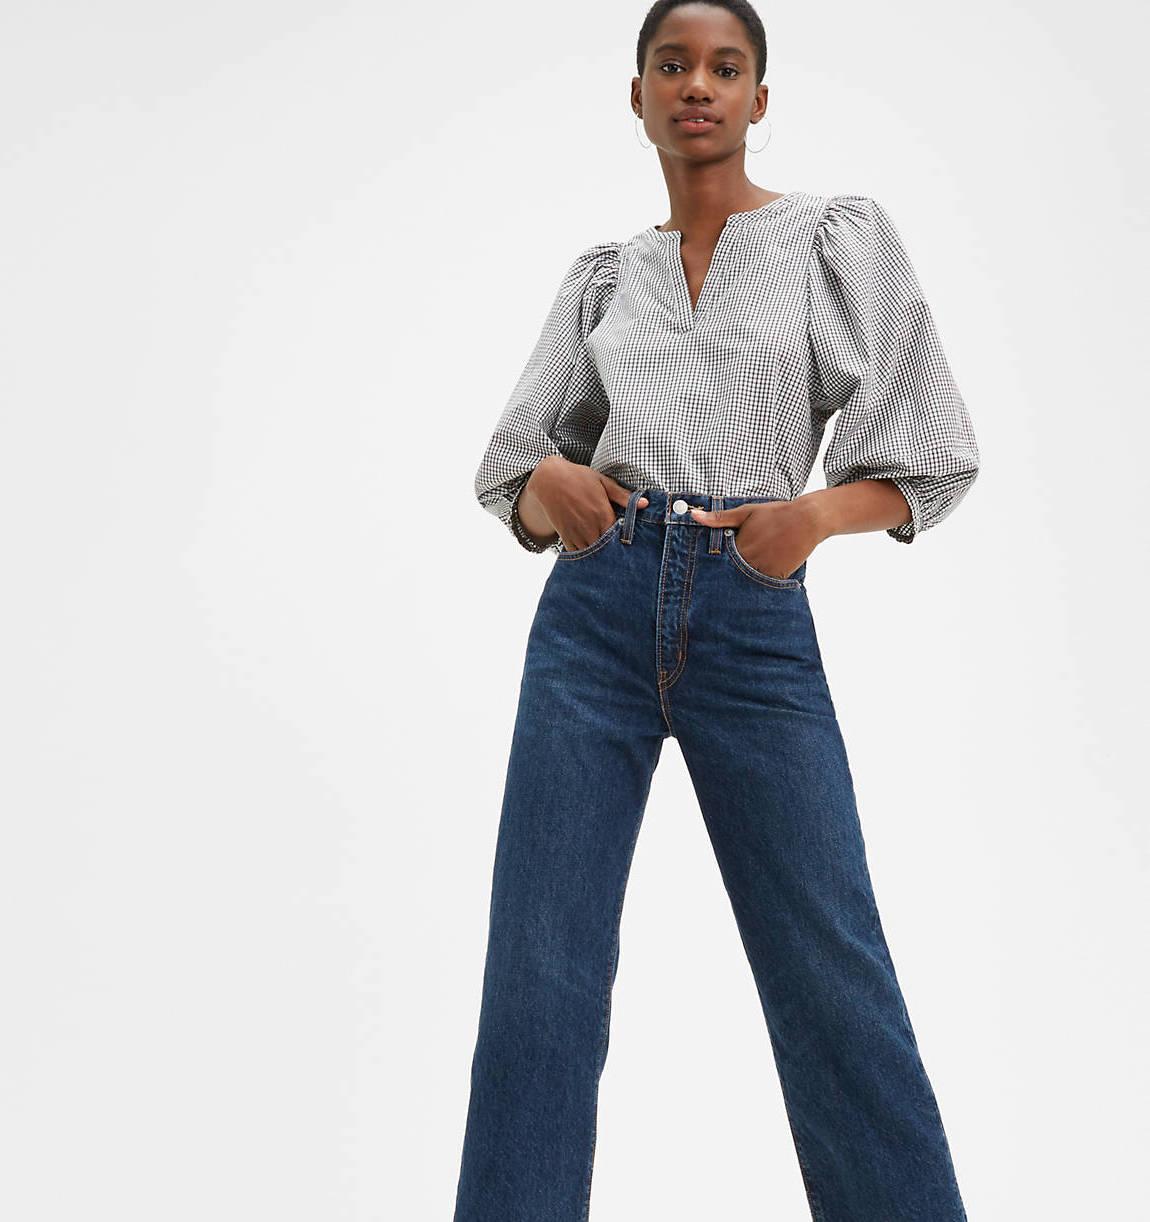 Levis hemp jeans